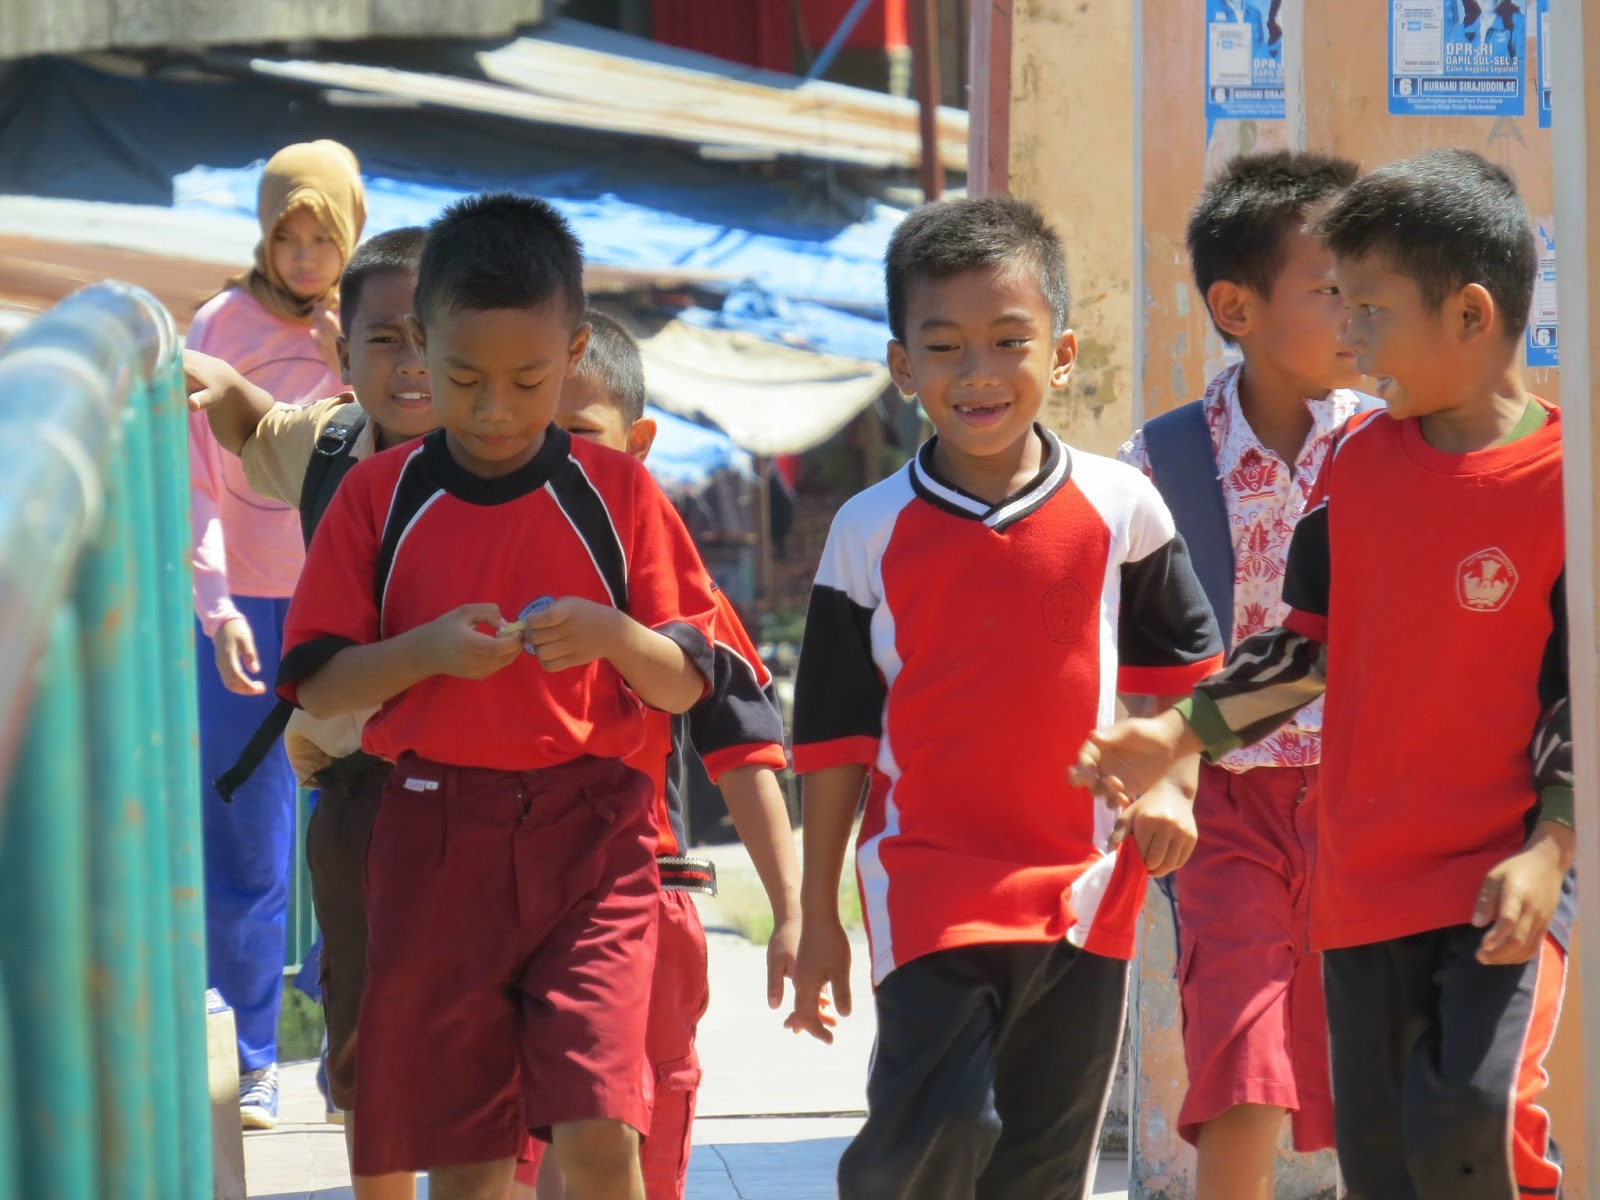 Wajah Polos Generasi Bangsa (Foto by Admin)